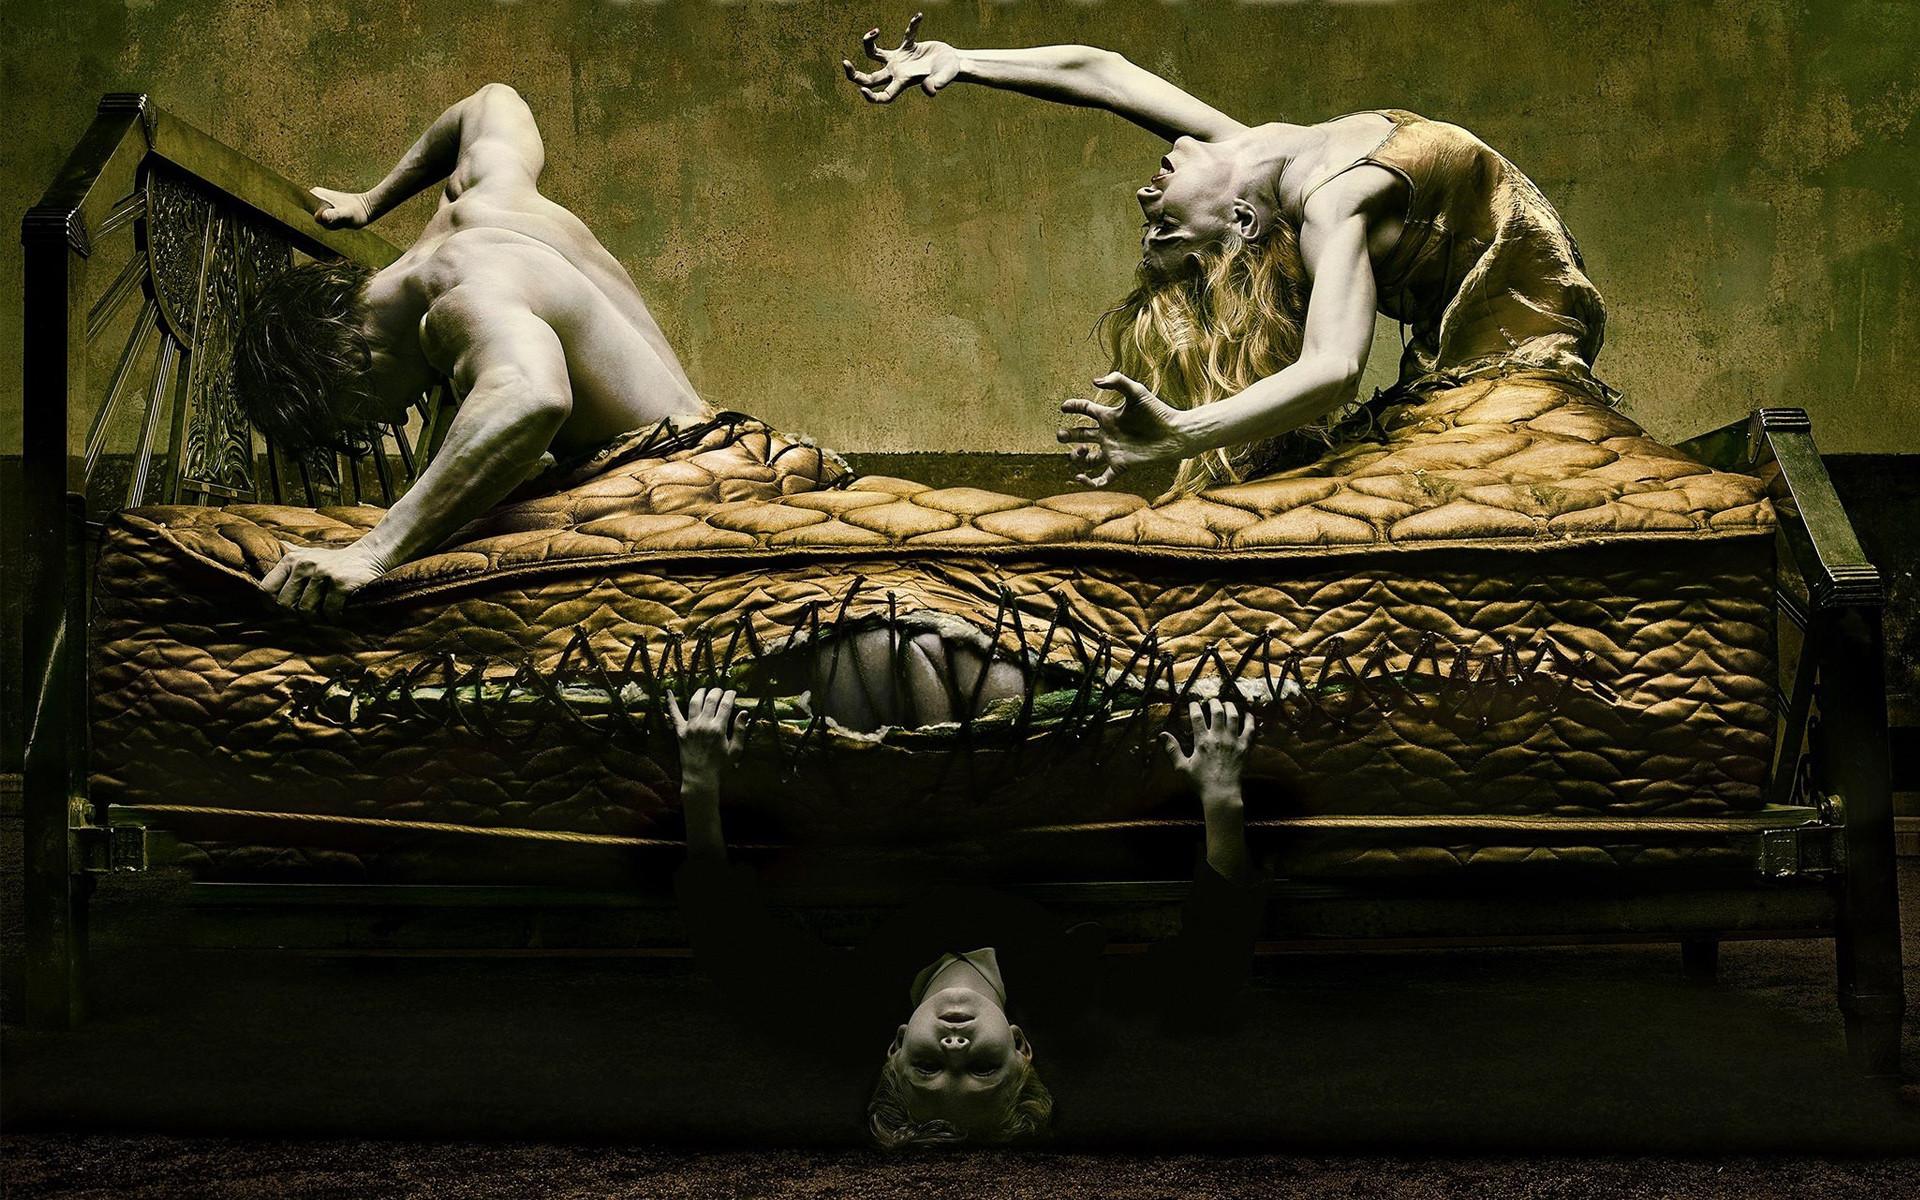 hotel american horror story wallpaper – photo #9. Classics of American  Literature Prof WeinsteinLiterature